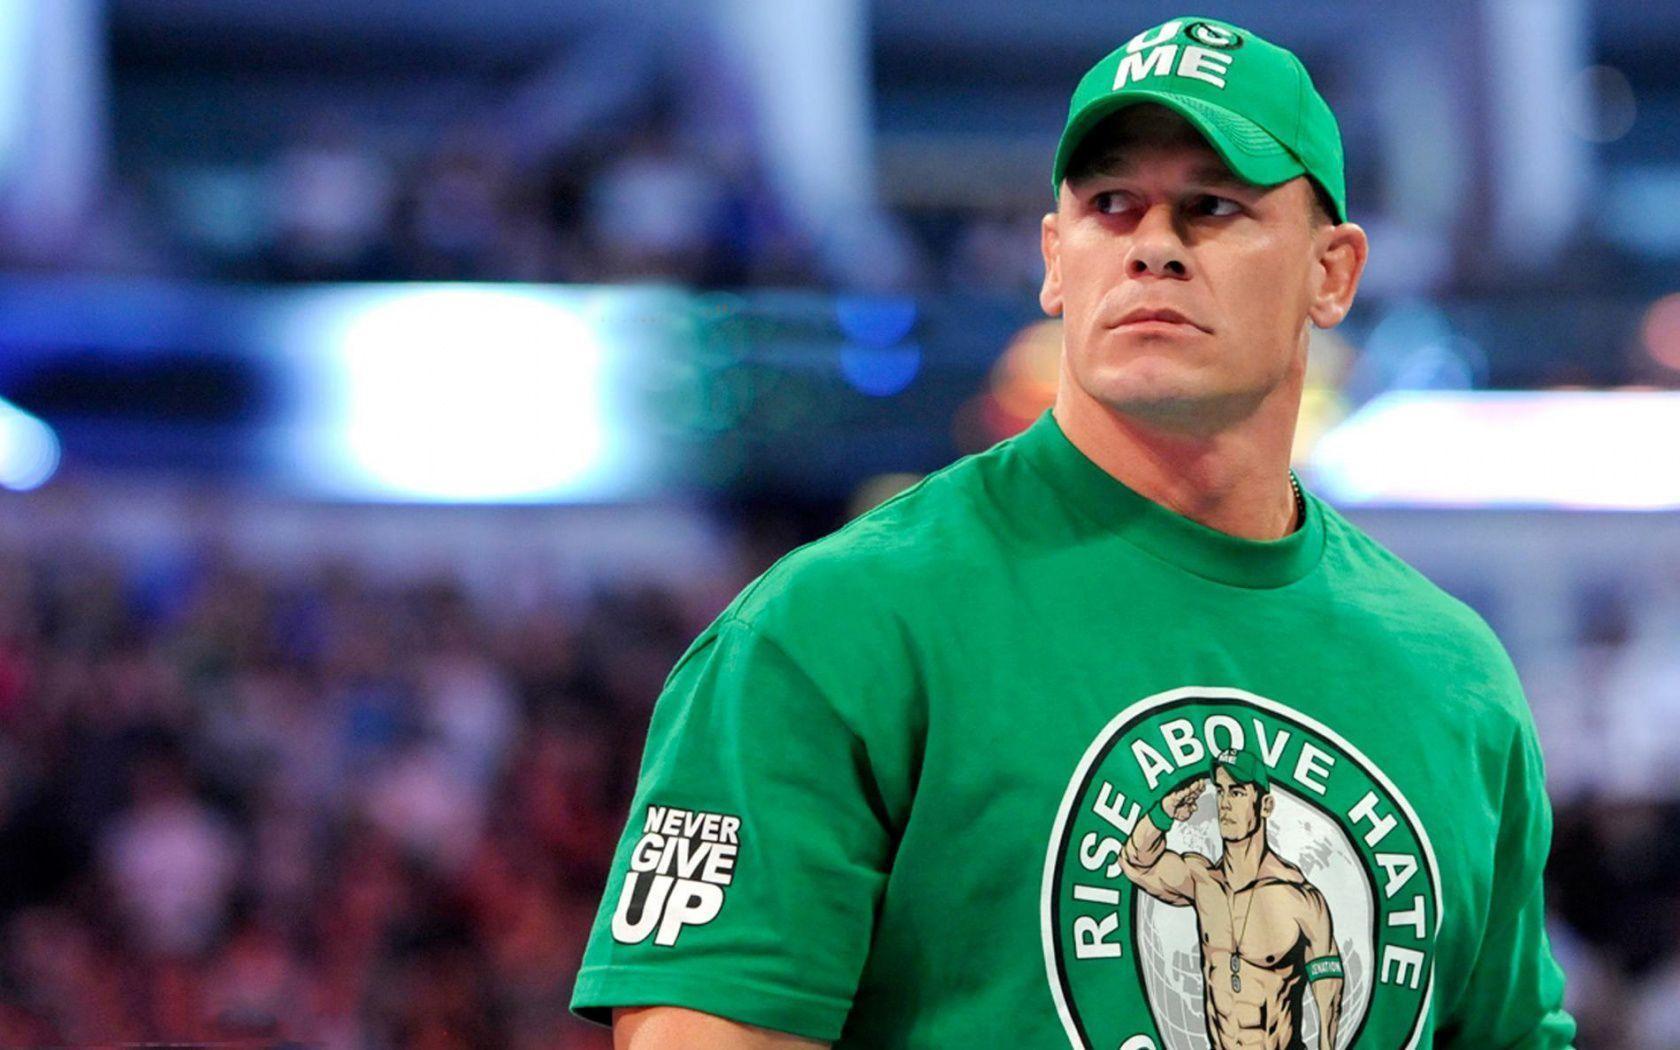 John Cena 2017 HD Wallpapers - Wallpaper Cave